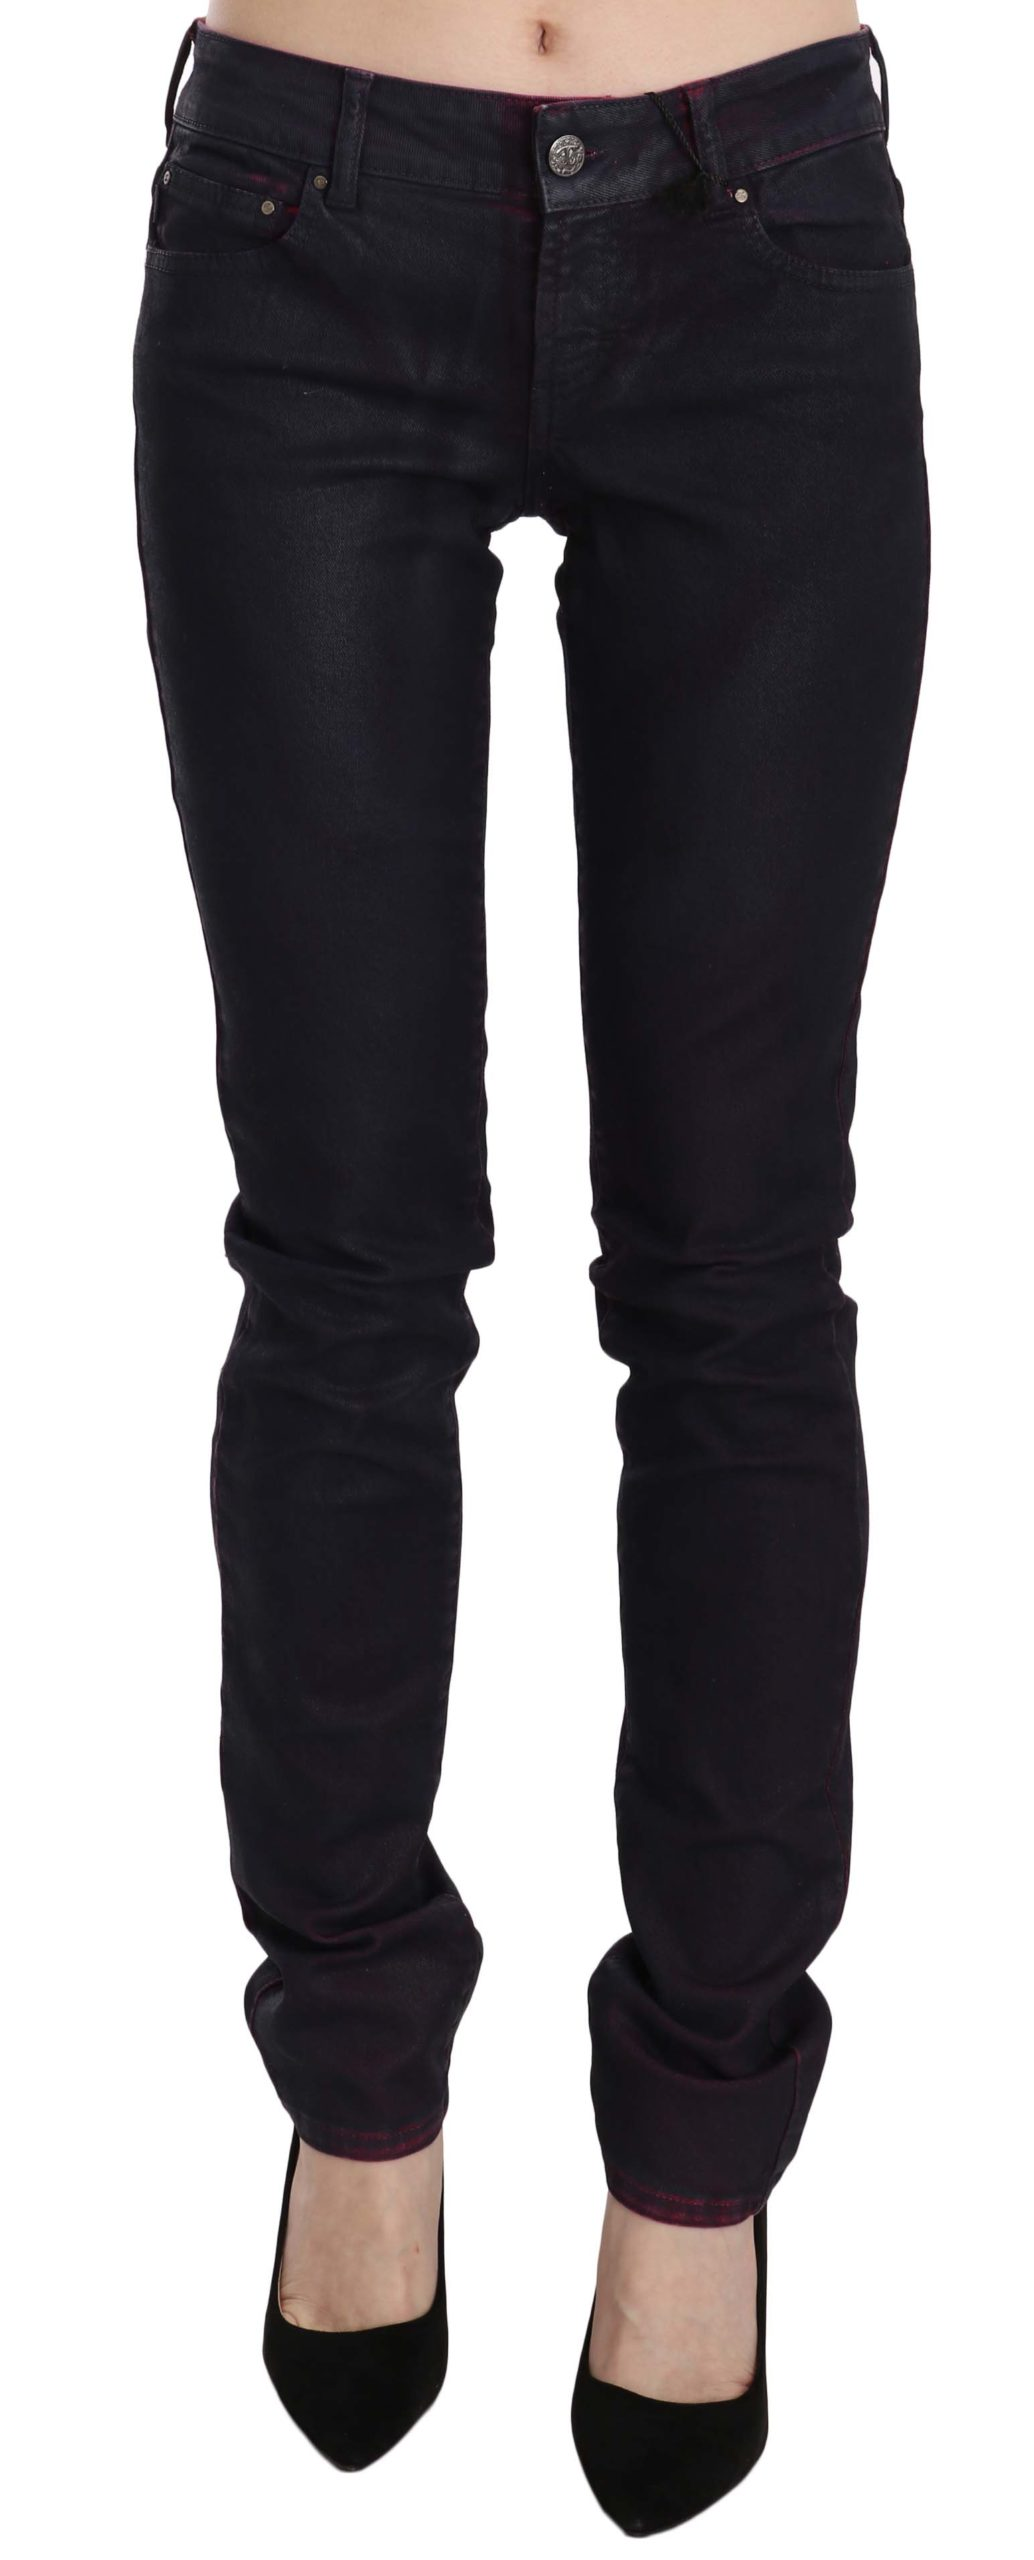 Just Cavalli Women's Low Waist Skinny Denim Trouser Black PAN70353 - W26